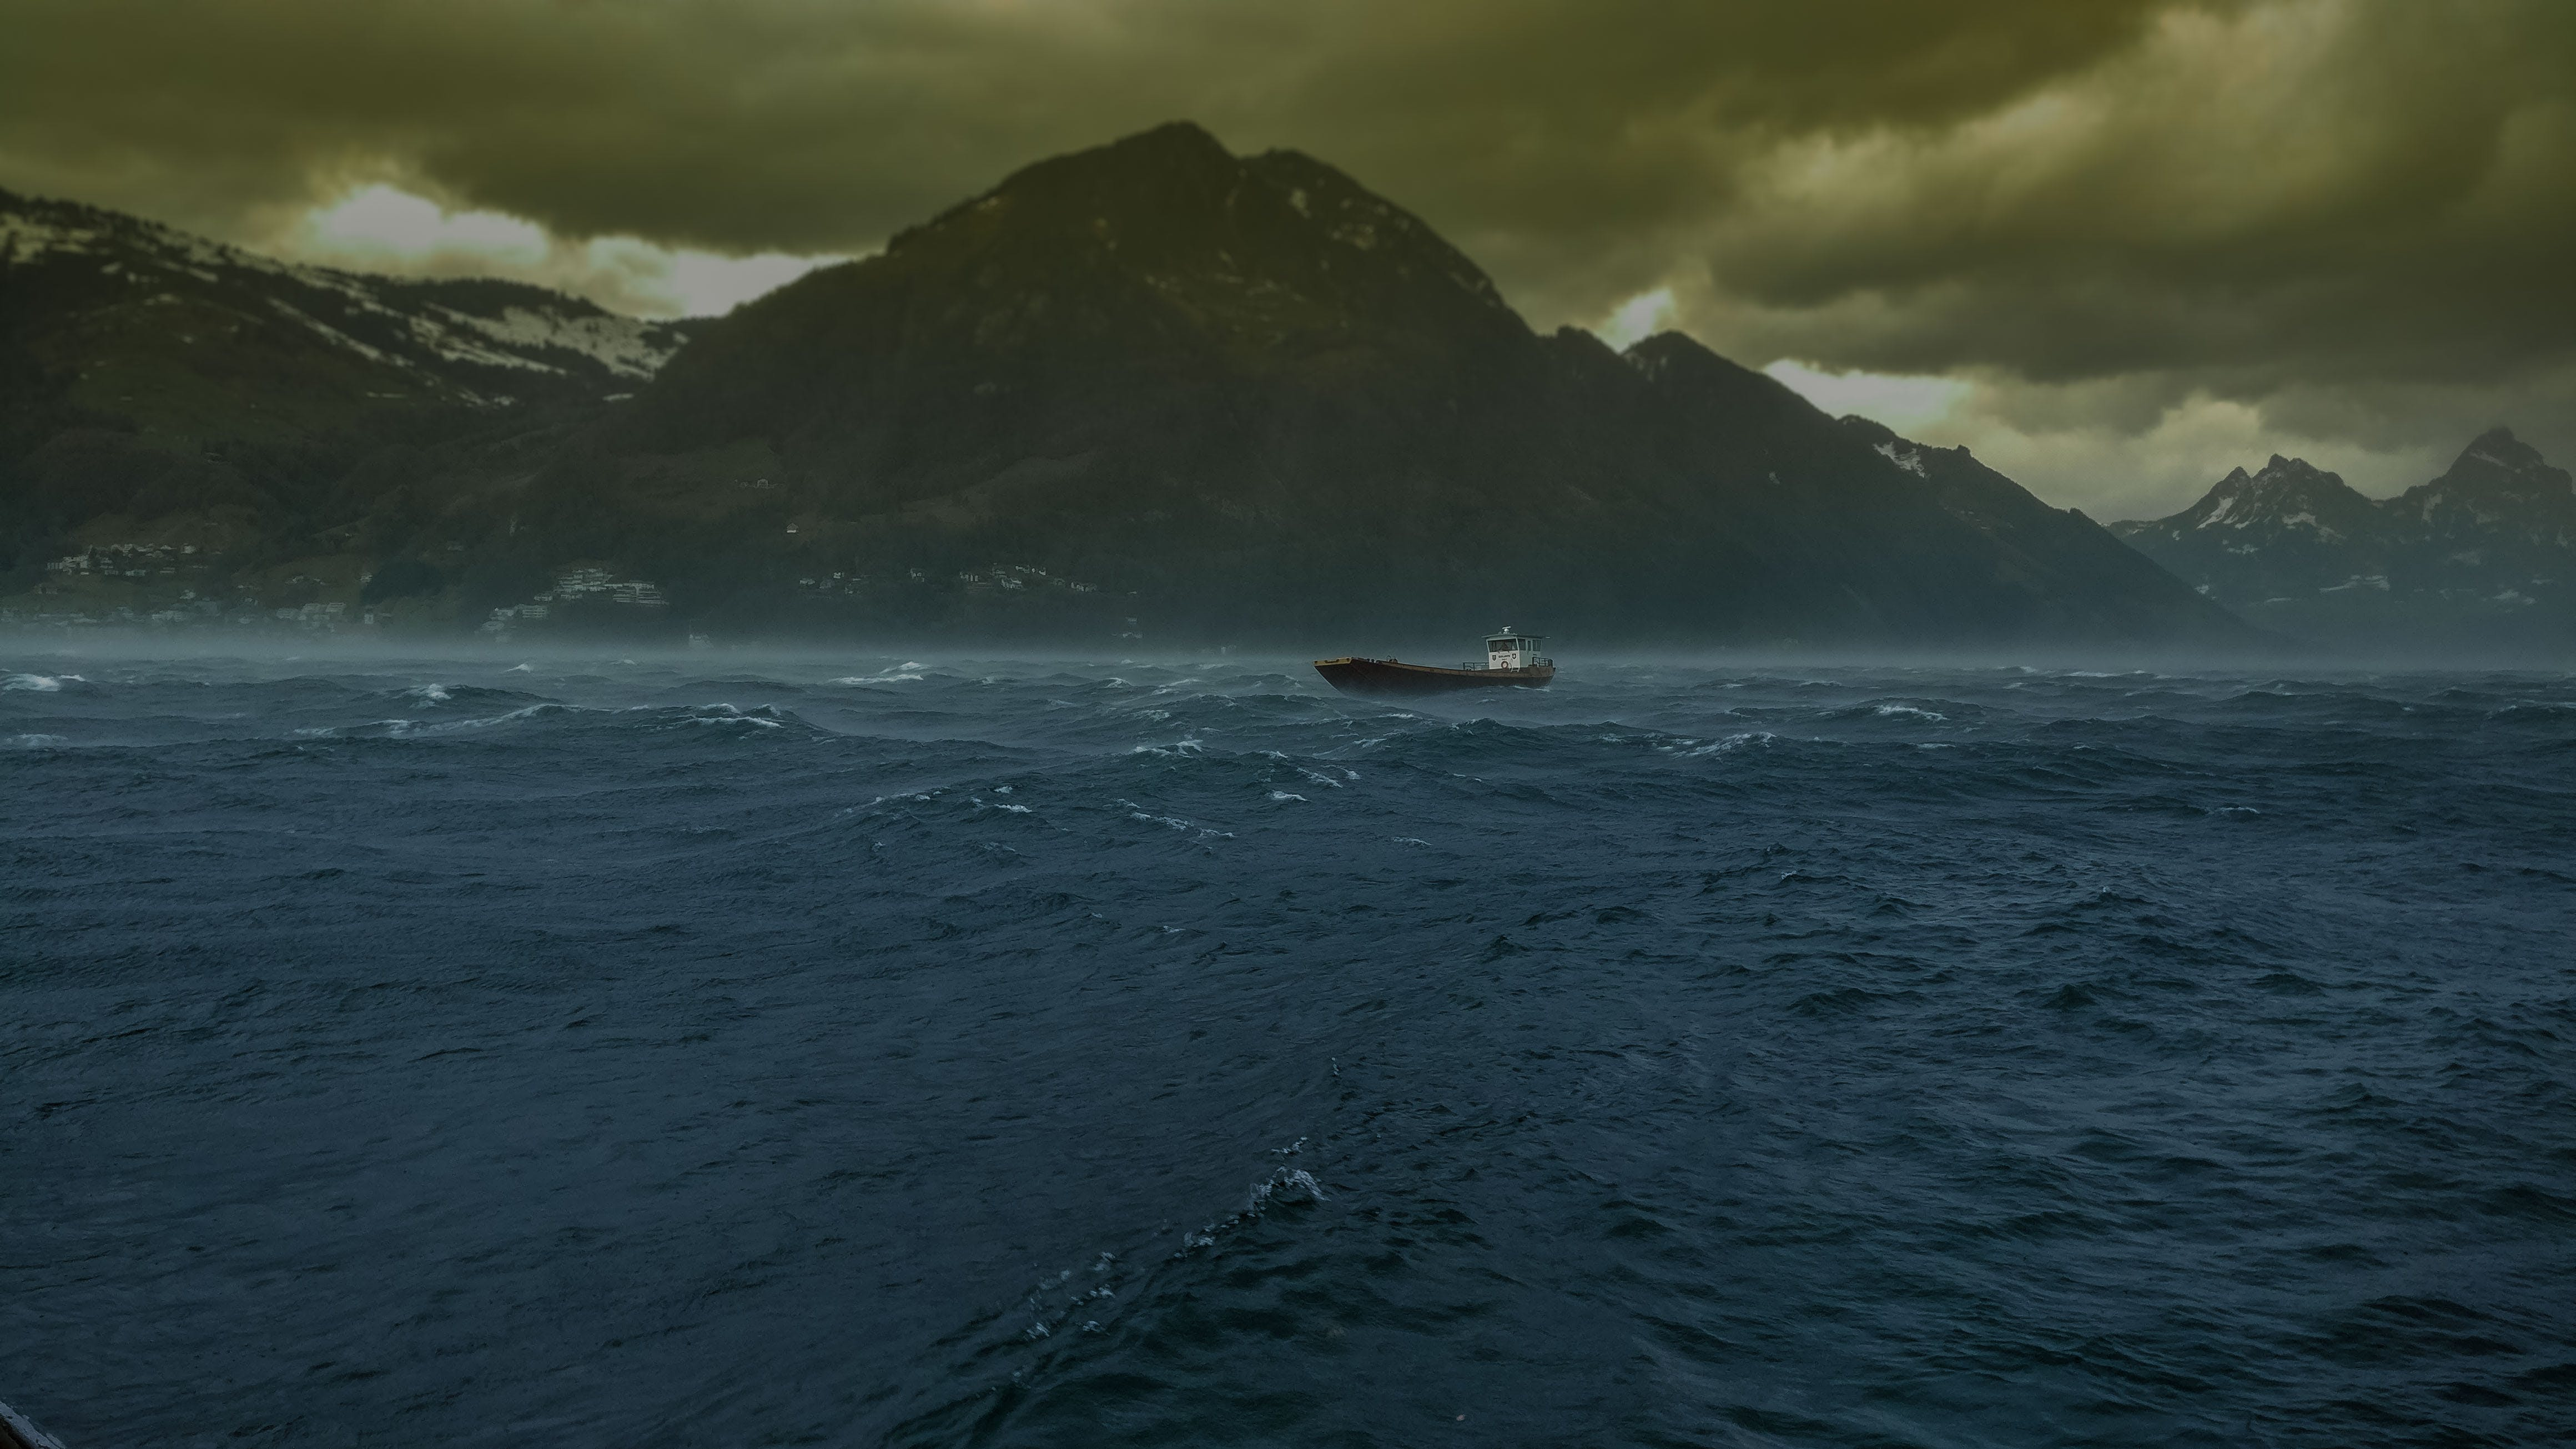 Free stock photo of ship, storm